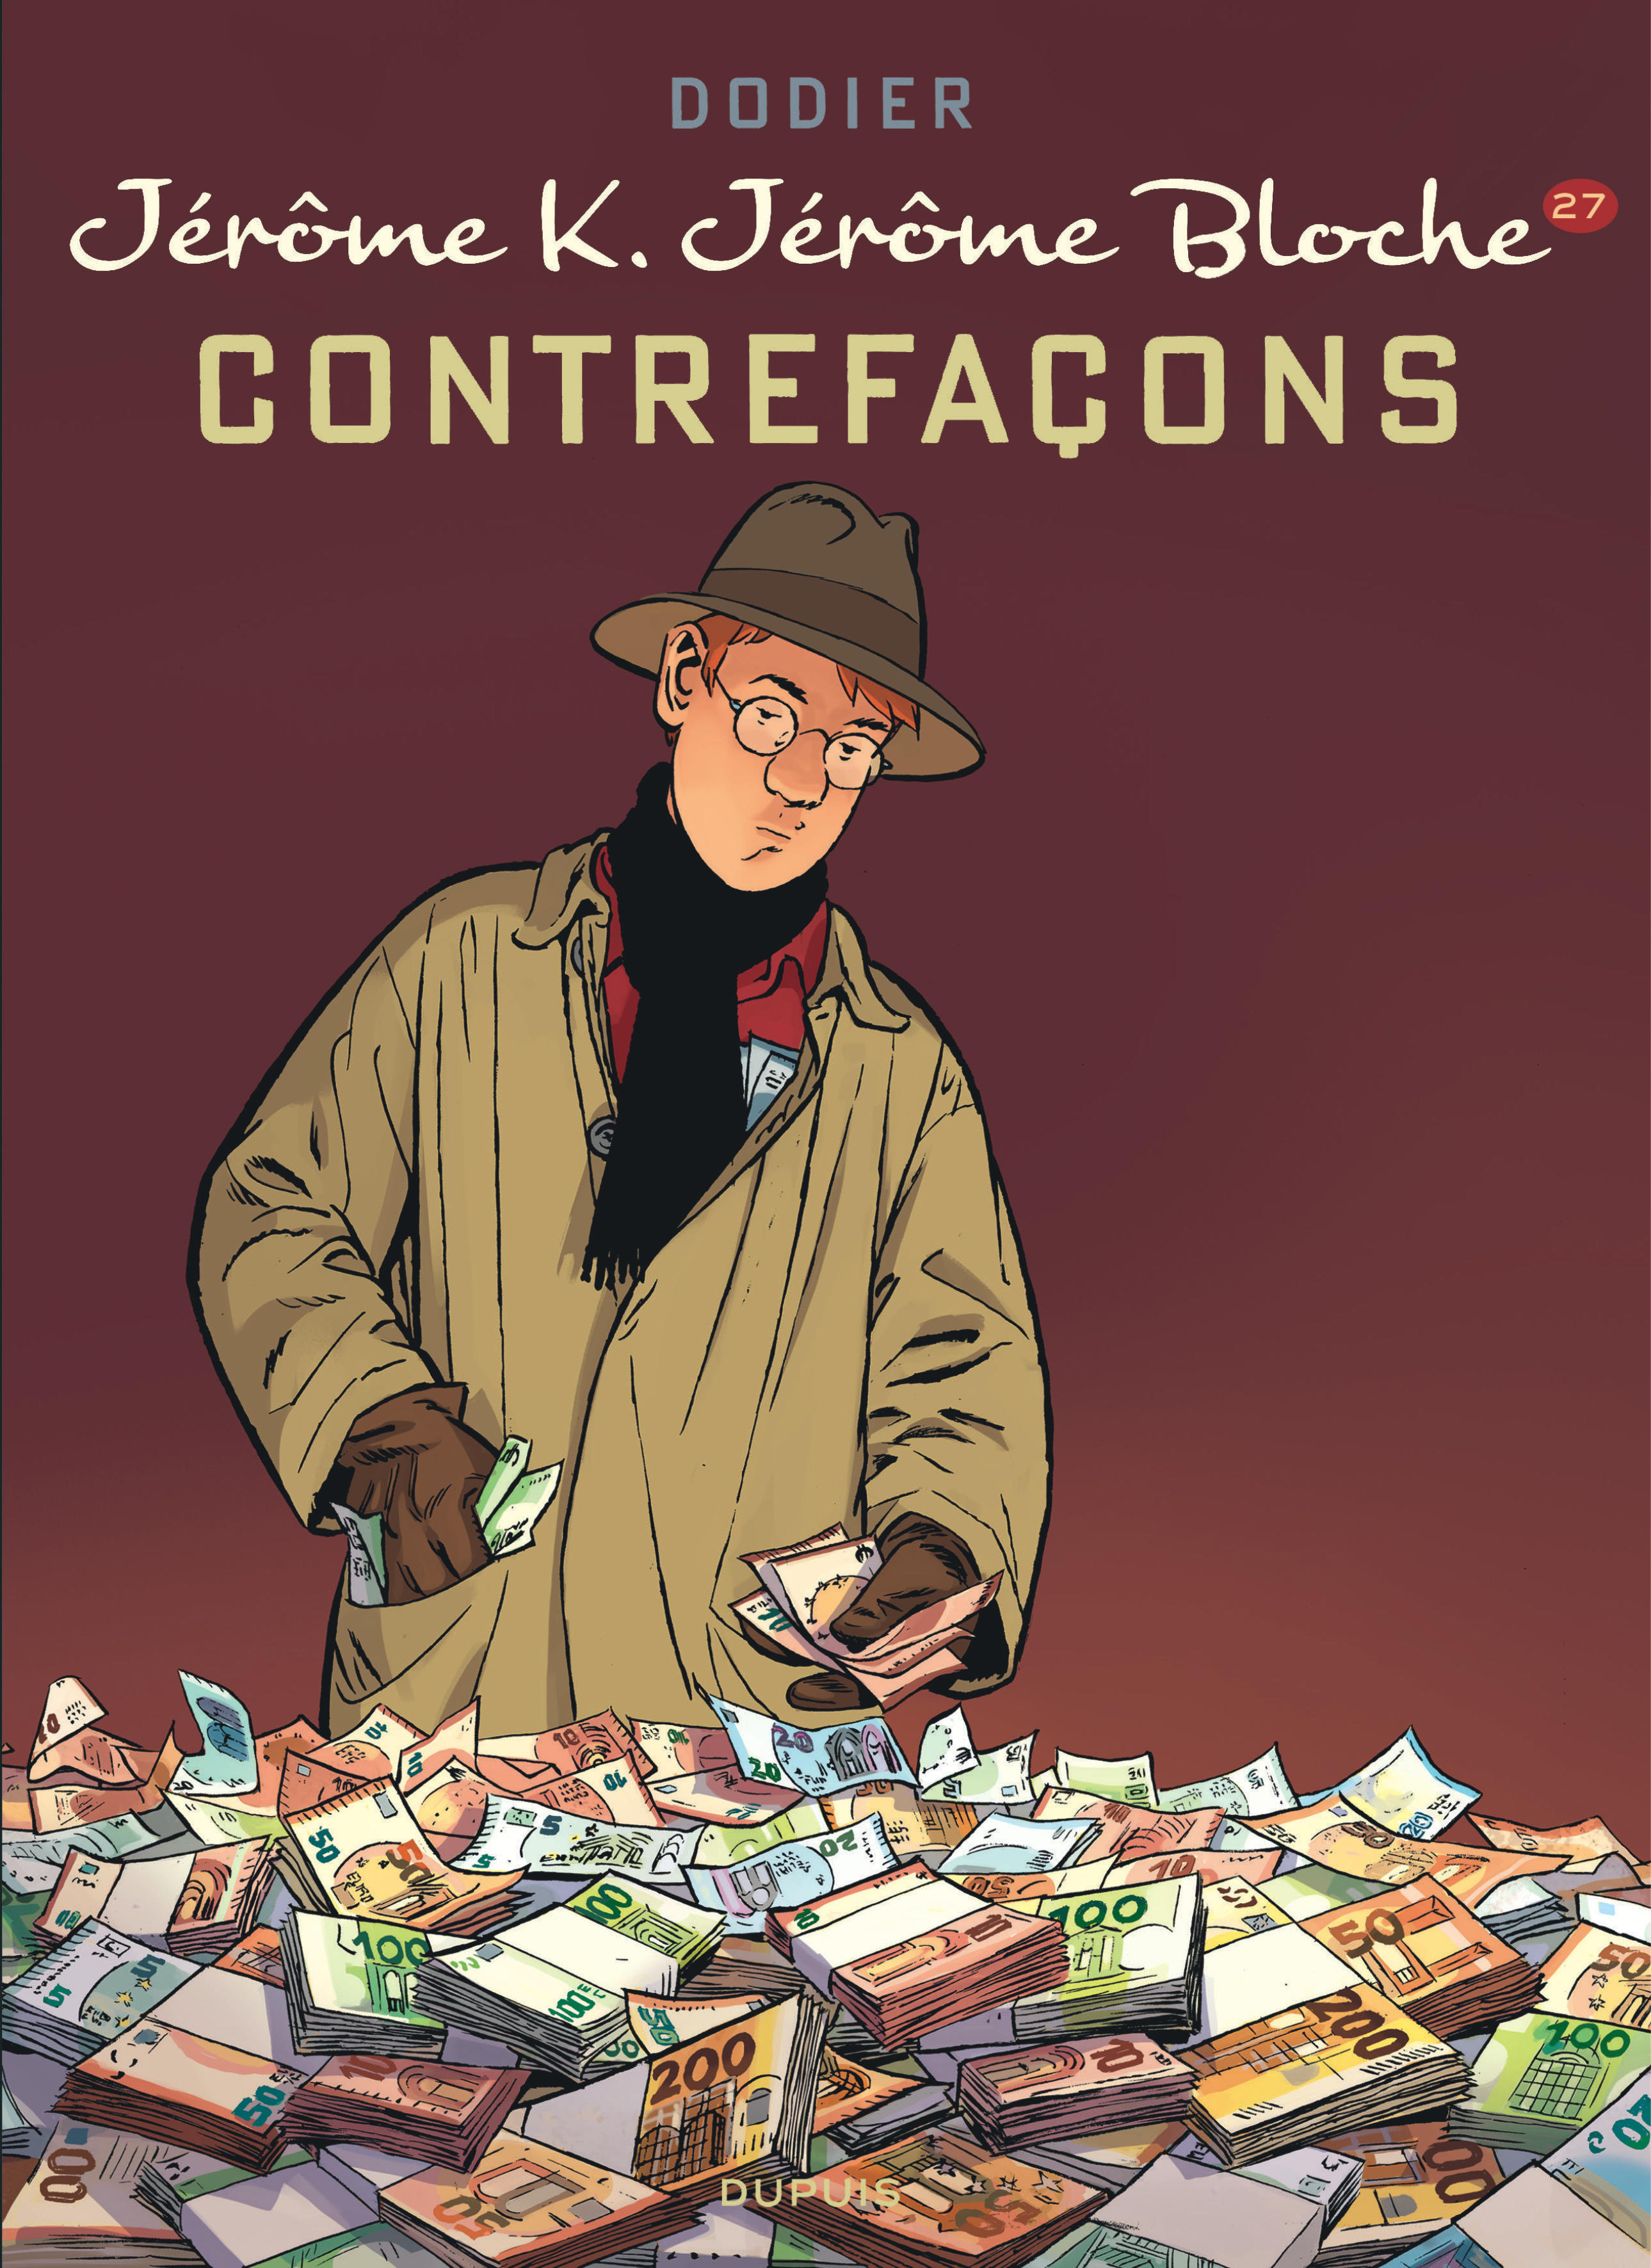 JEROME K. JEROME BLOCHE - TOME 27 - CONTREFACONS